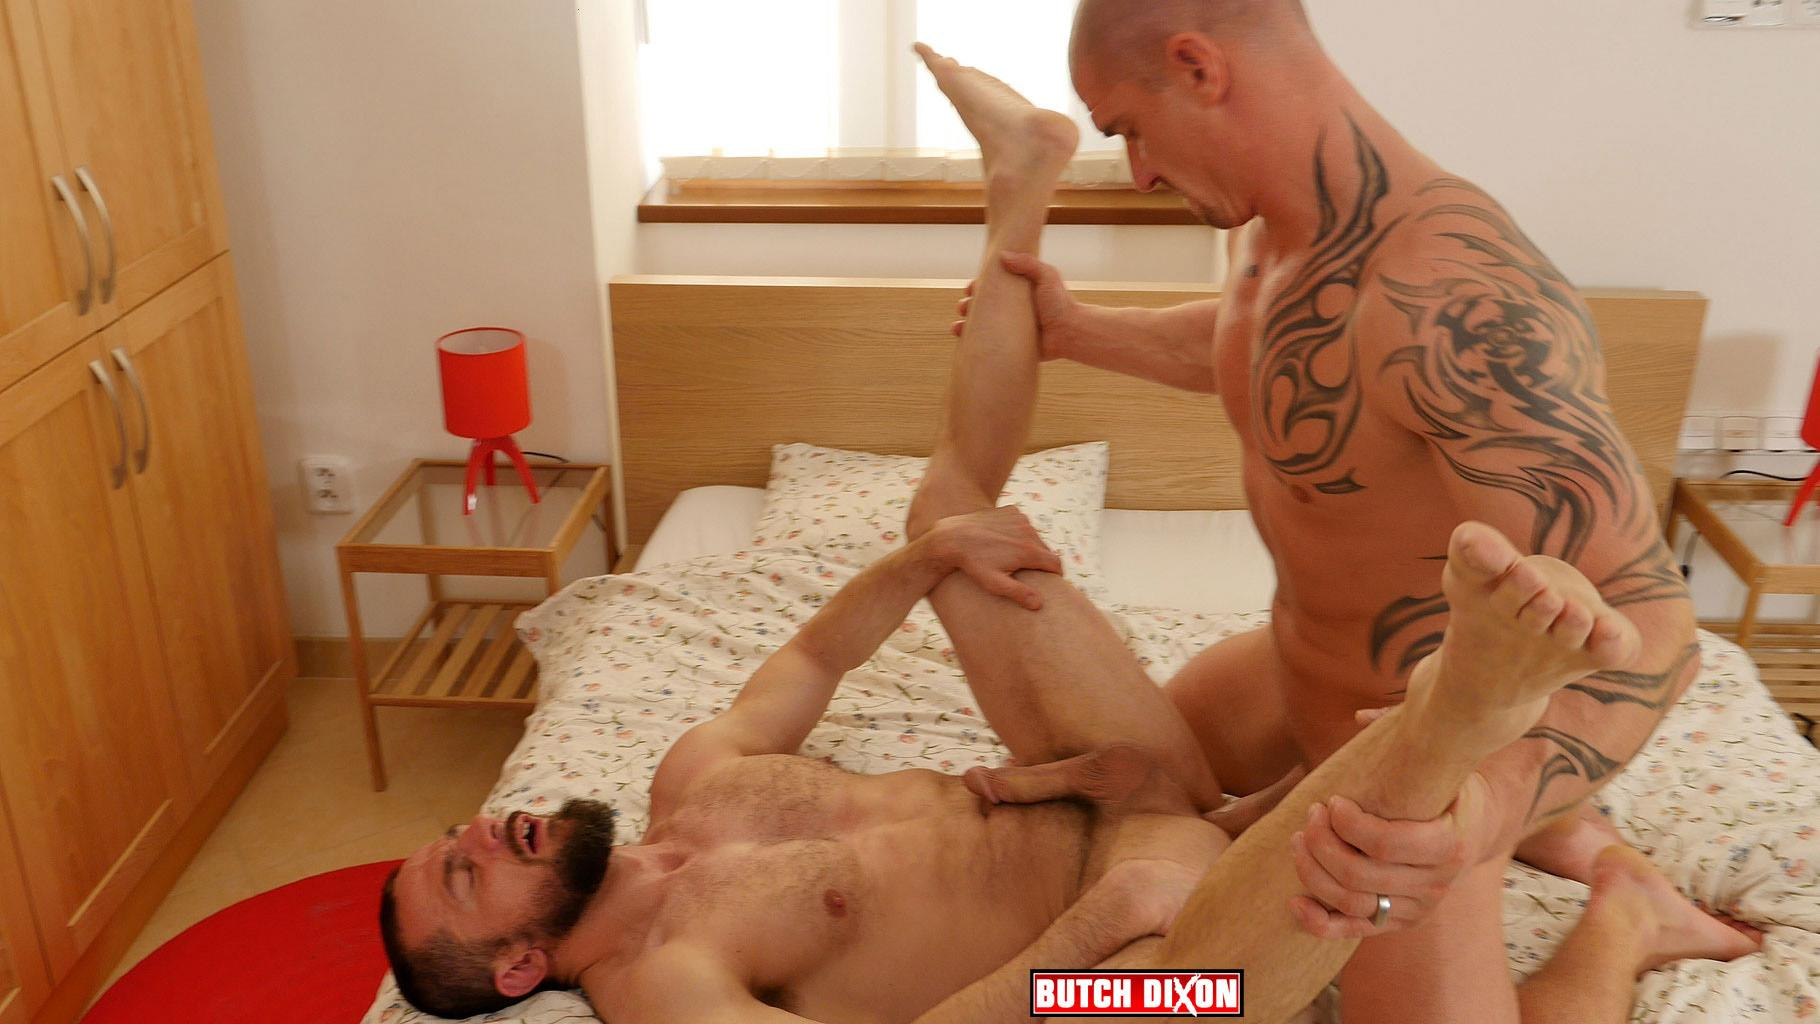 Butch-Dixon-Erik-Lenn-and-Mike-Bourne-Masculine-Guys-Fucking-Bareback-Amateur-Gay-Porn-22 Beefy Masculine Guys Fucking Bareback With A Big Uncut Cock